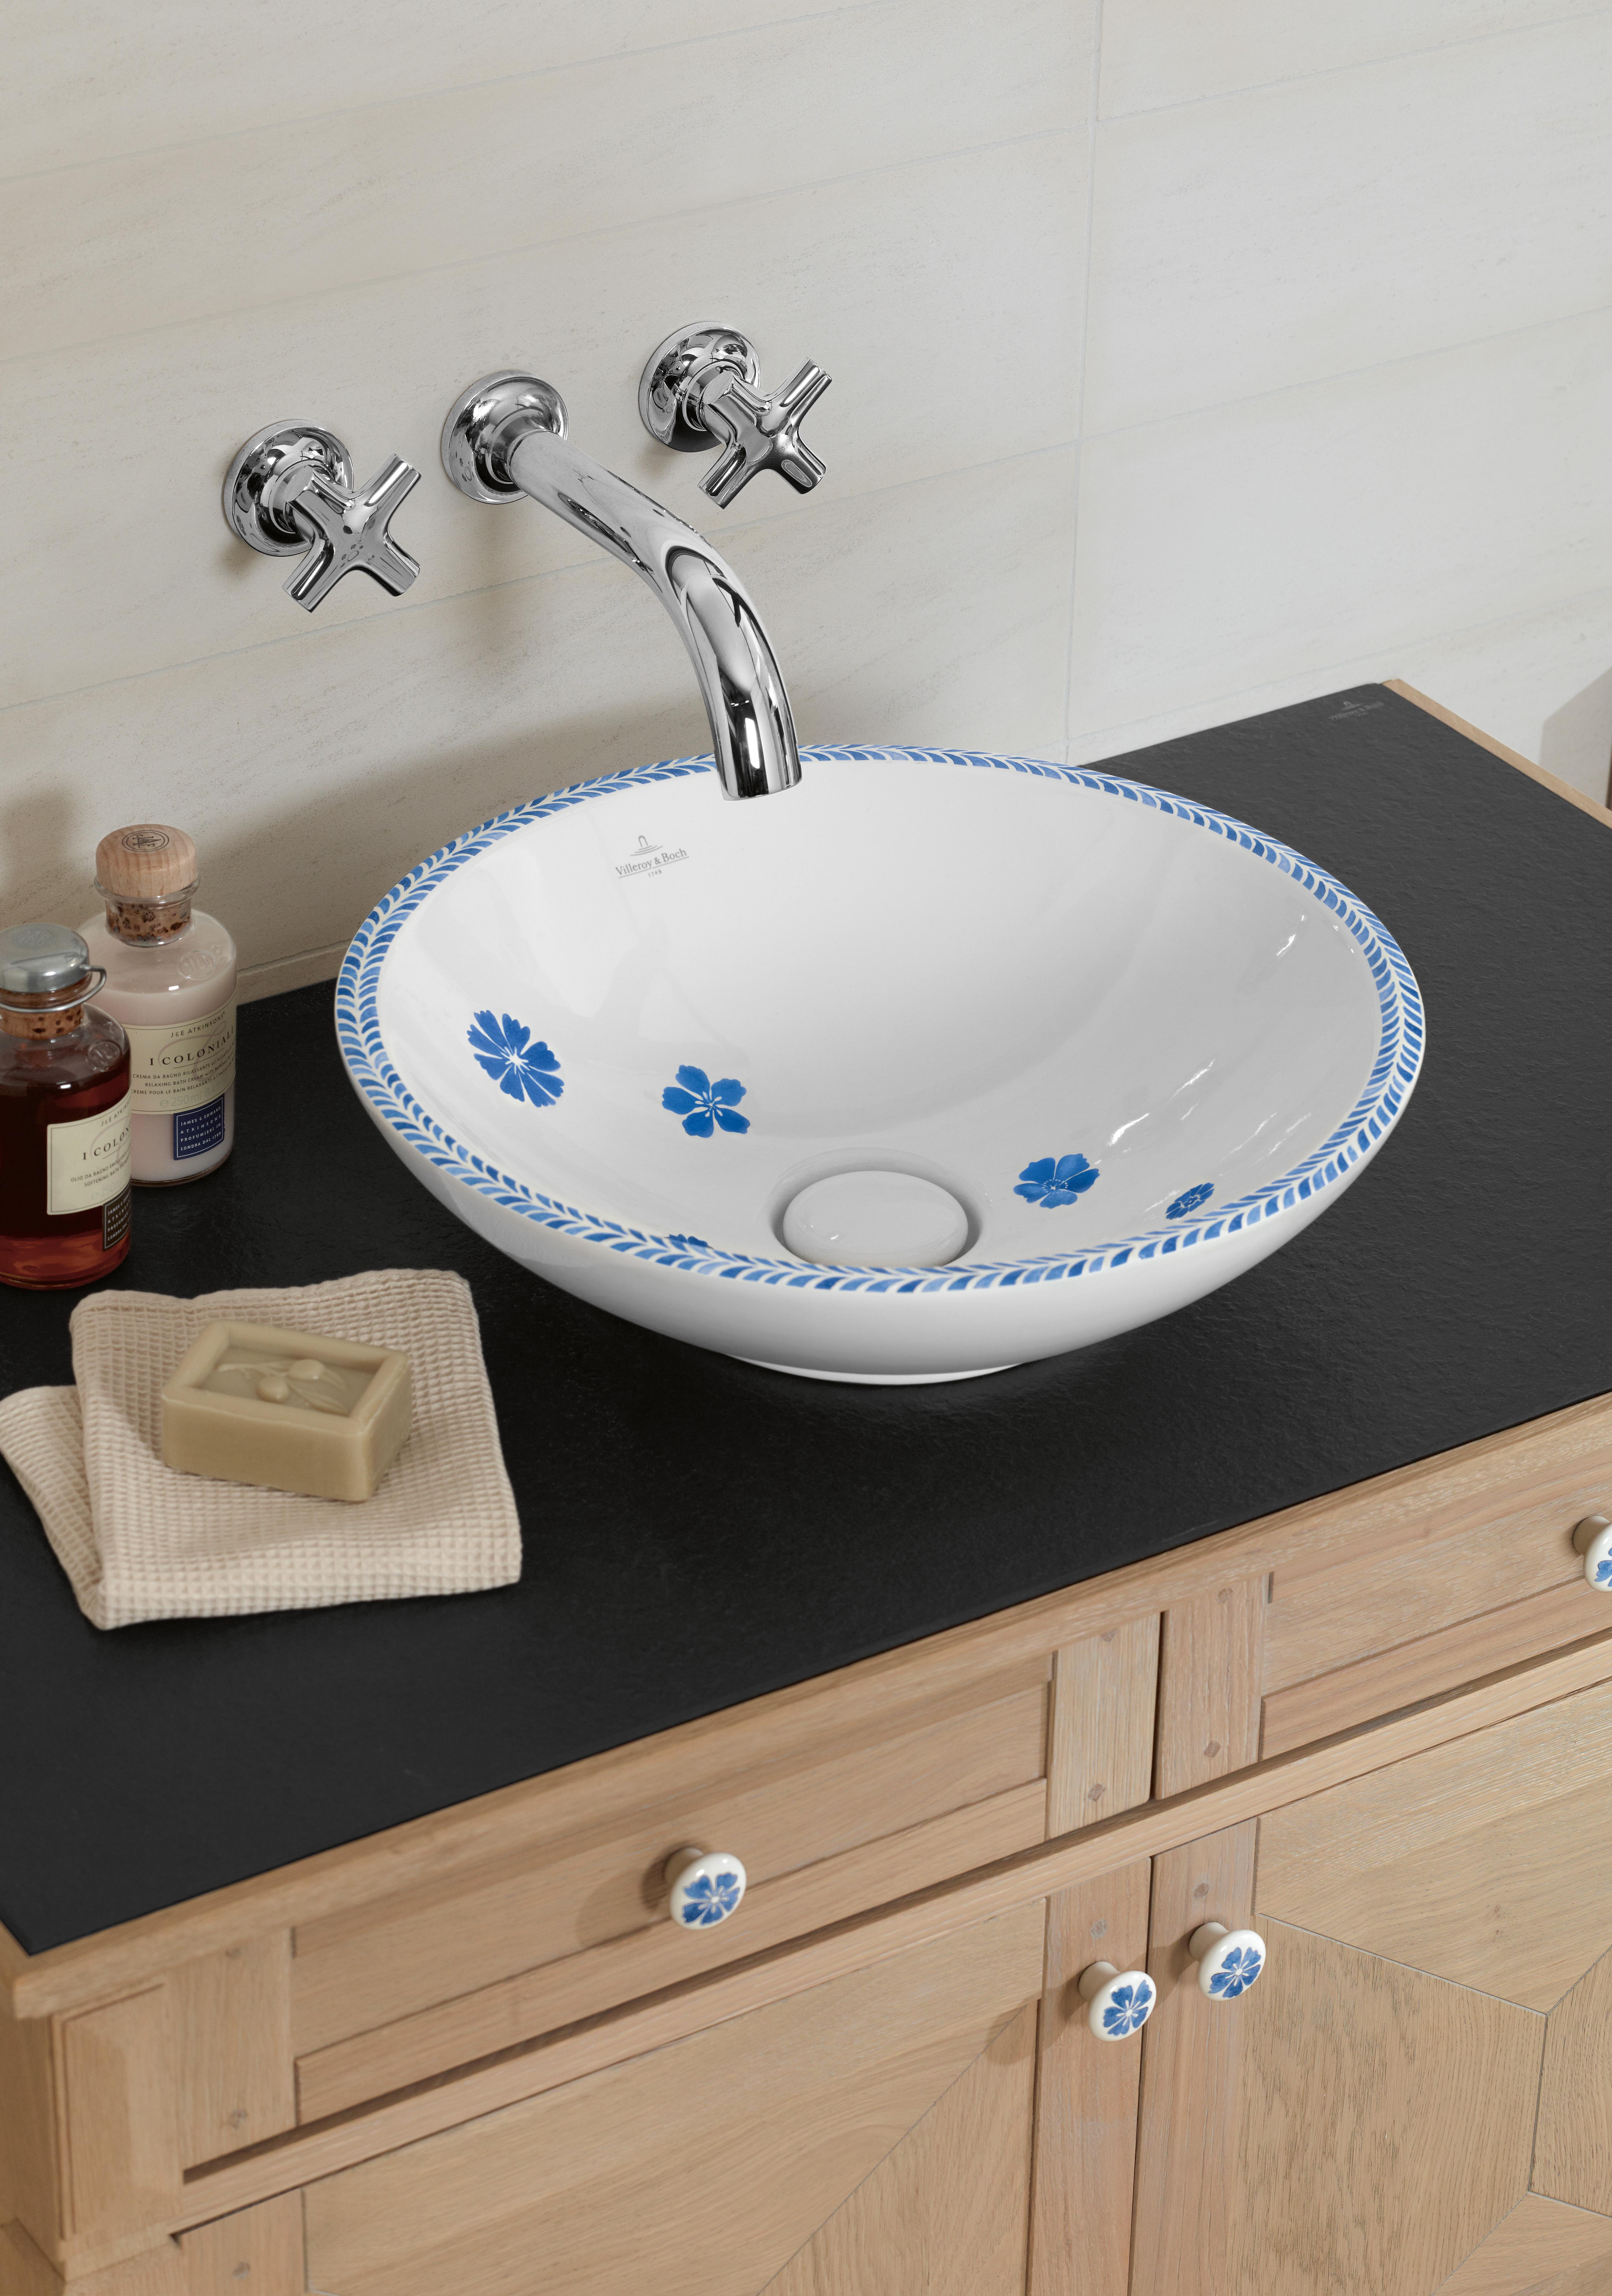 Loop & Friends Washbasin, Surface-mounted washbasin, Washbasins, Surface-mounted washbasins